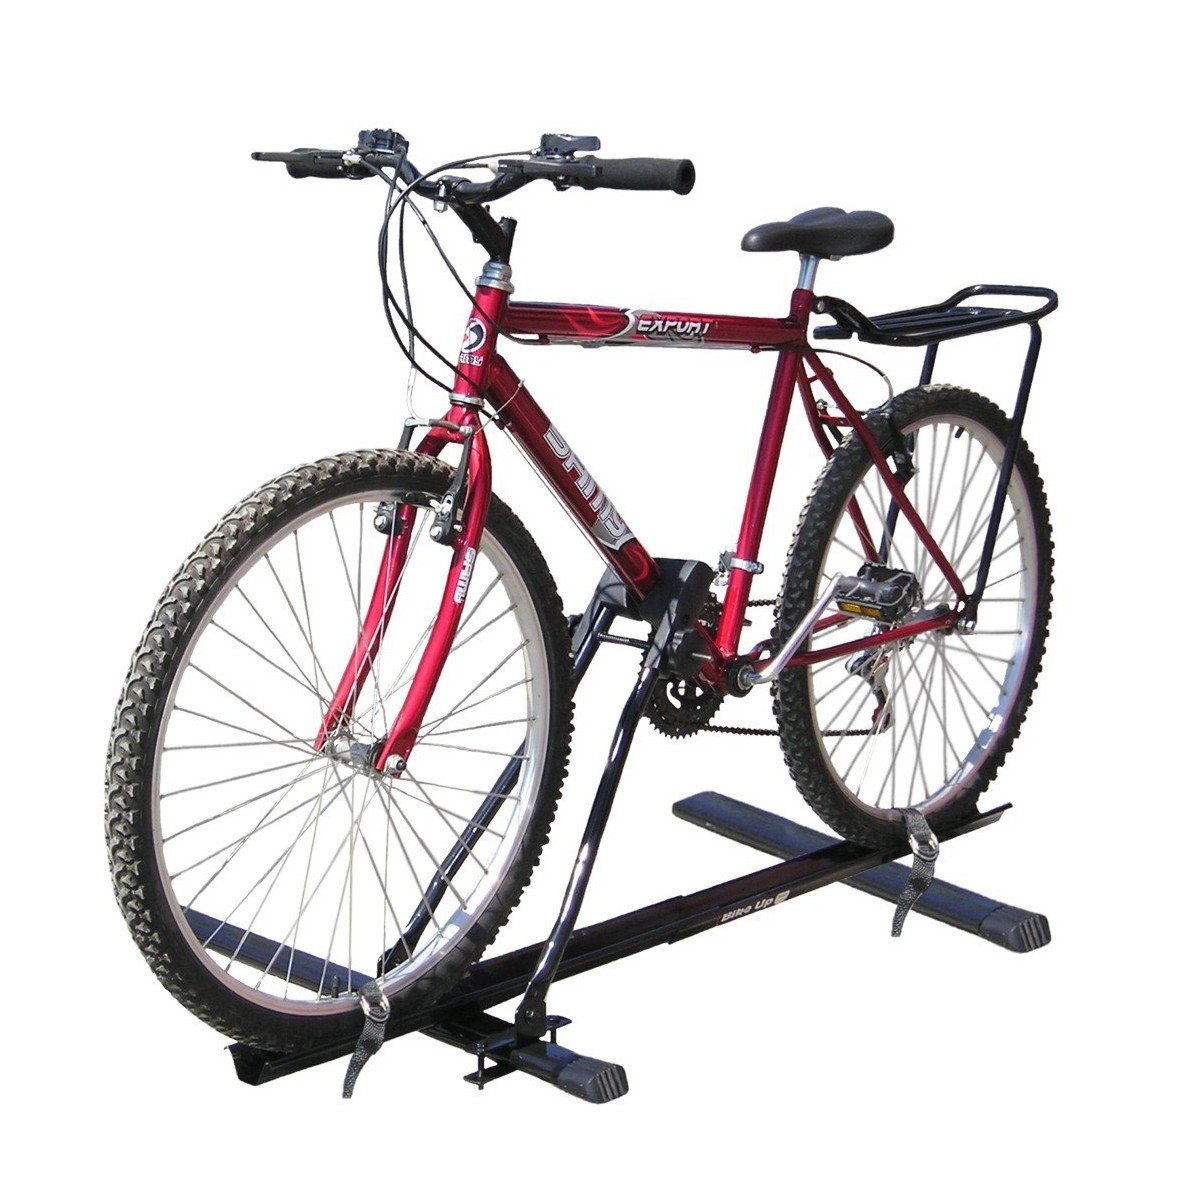 Transbike Rack De Teto Bike Up Para 1 Bicicleta